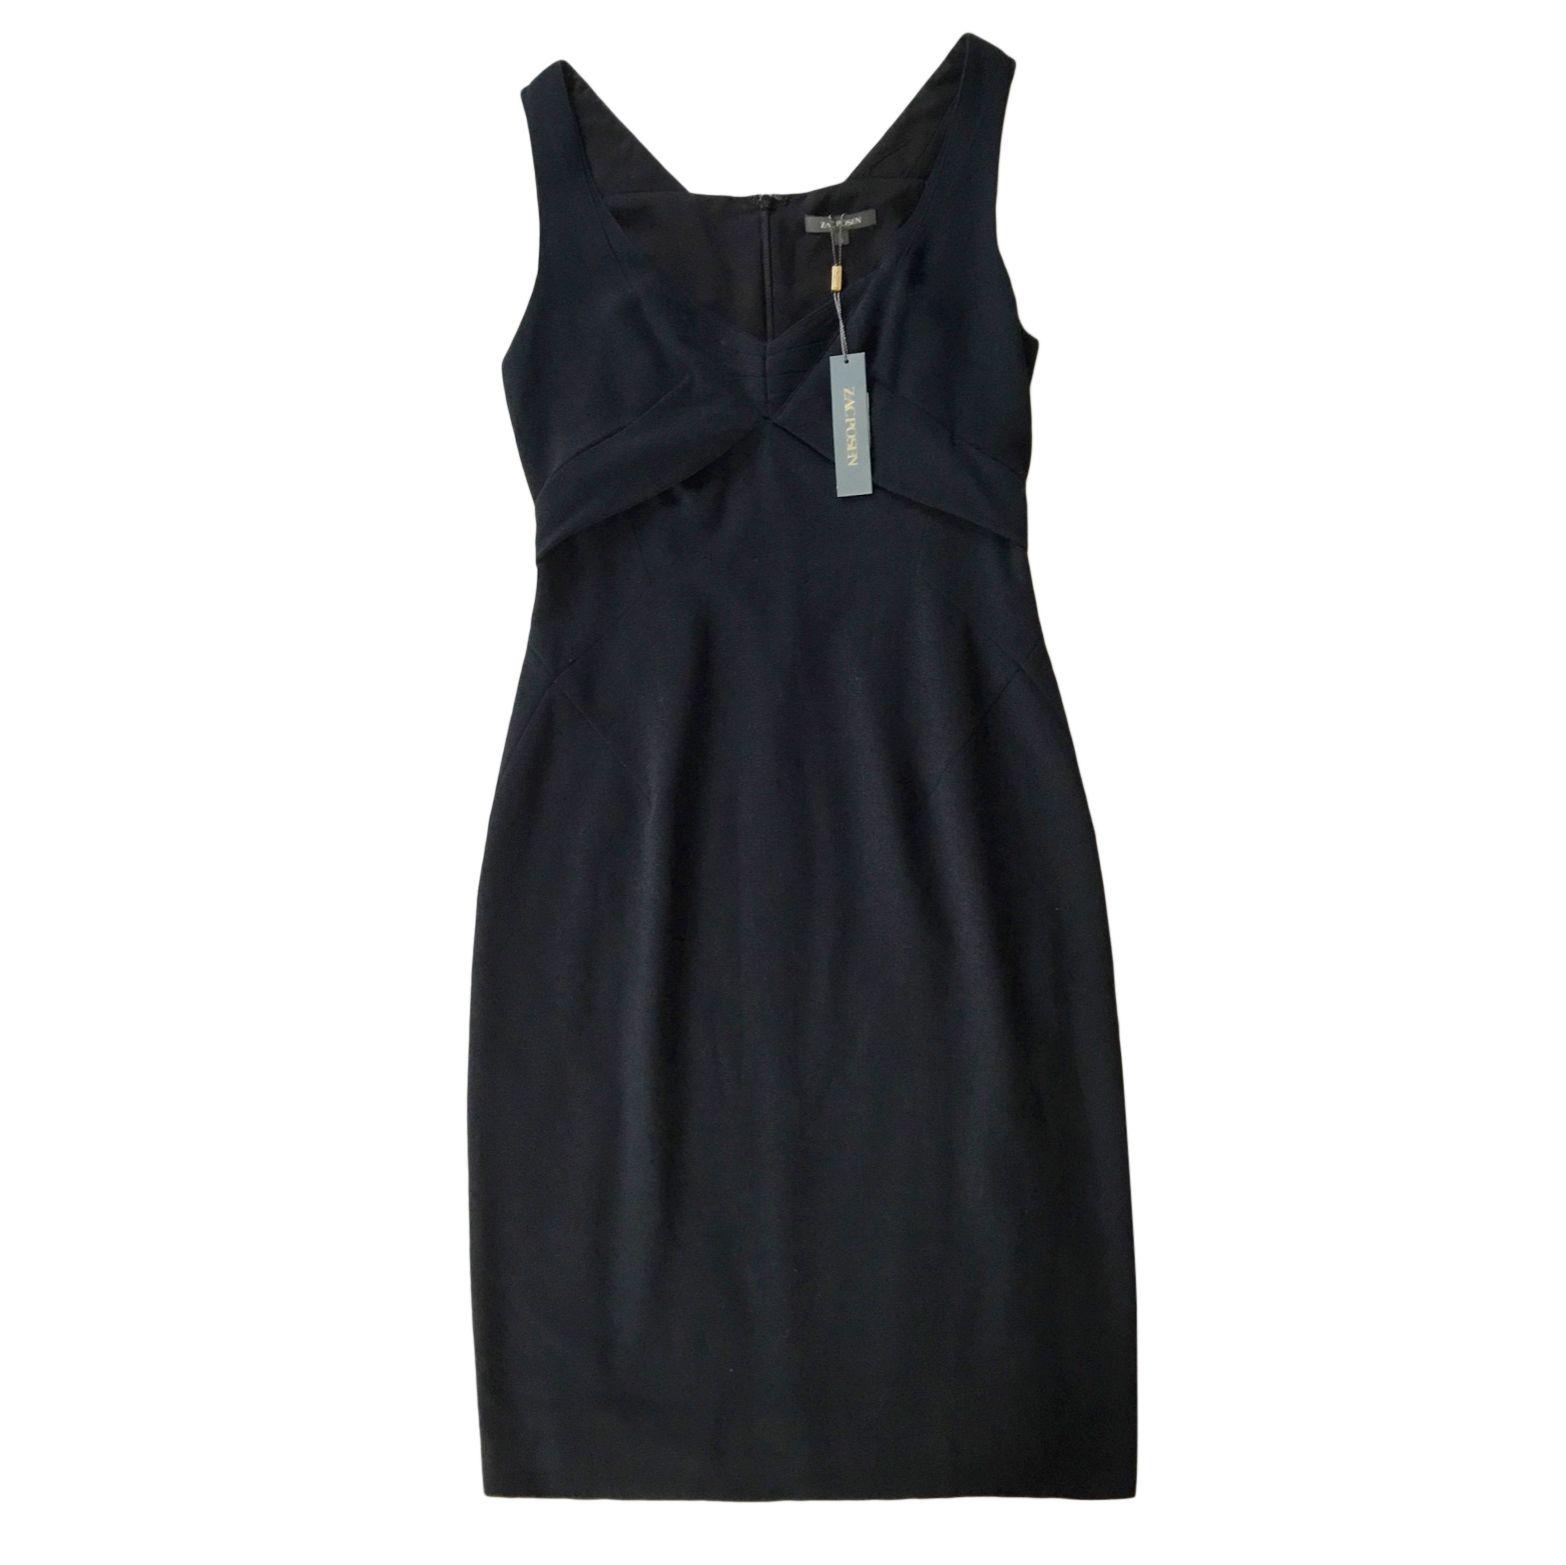 Zac Posen Black Crepe Dress